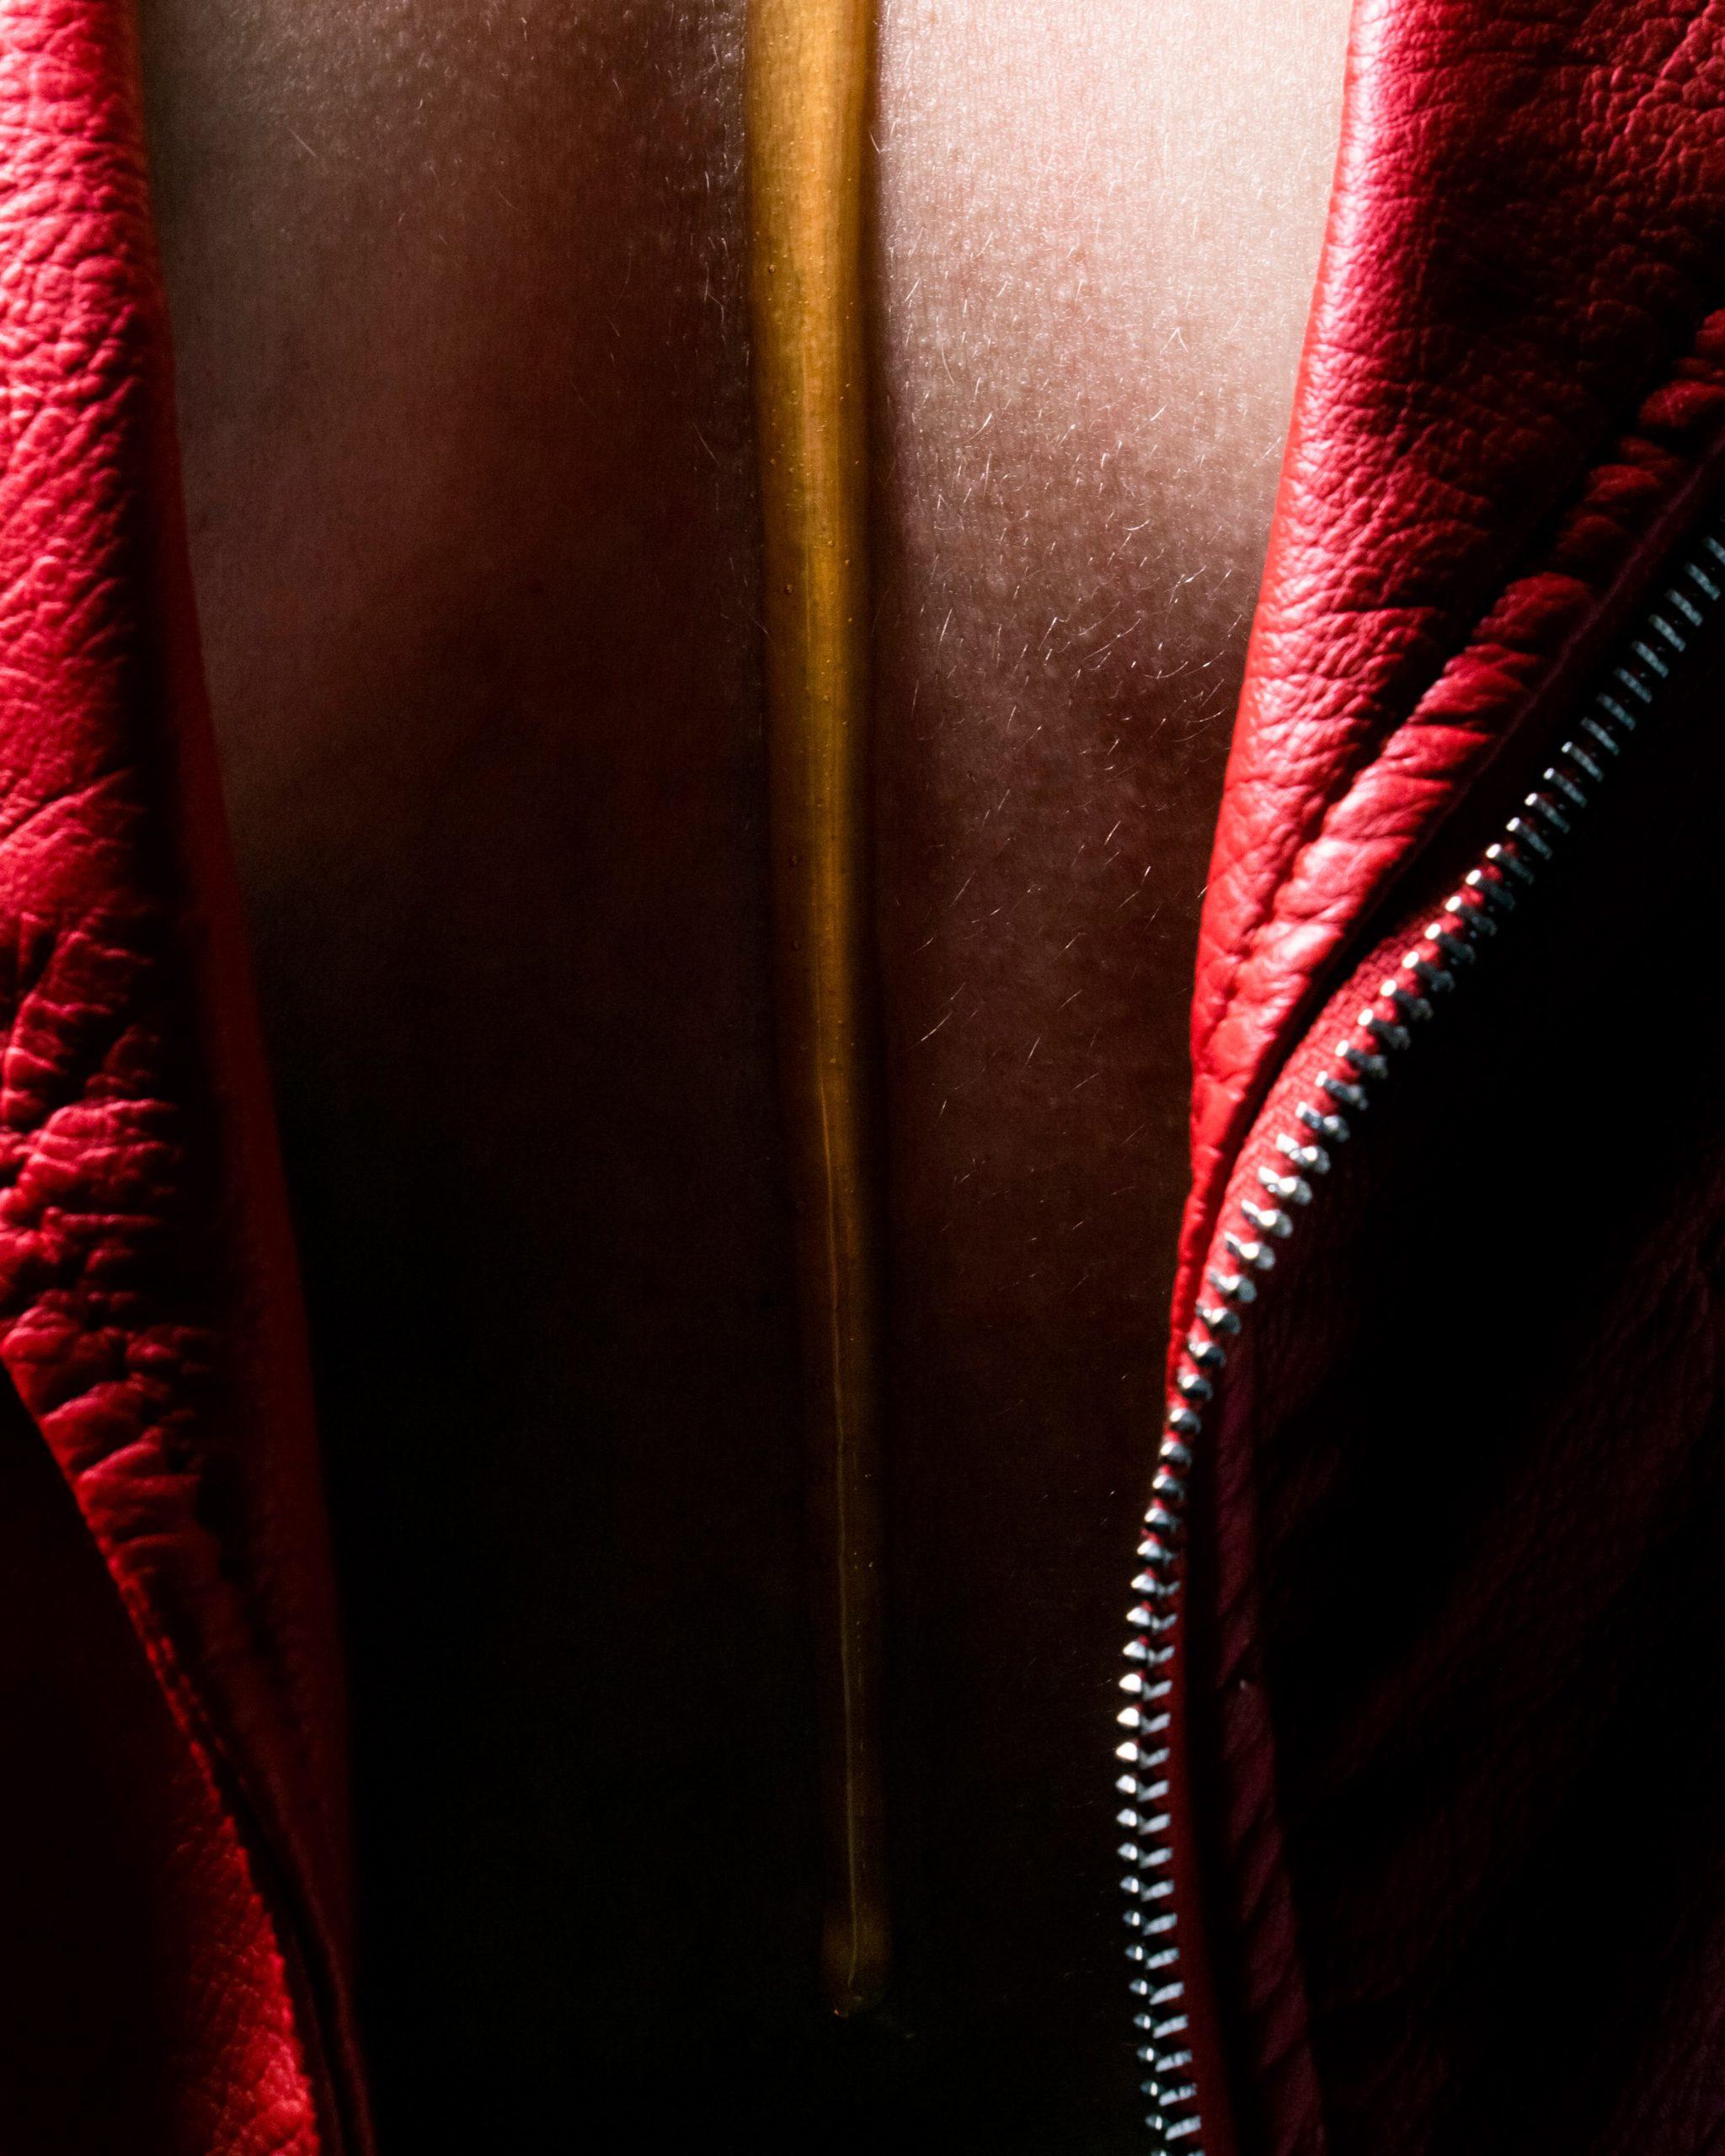 Categorie: Boudoir & Artistic Nude, Fine Art, Portrait - Photographer: FEDERICO ESPOSITO - Model: FEDERICA CERMINARA - Location: Lamezia Terme, CZ, Italia